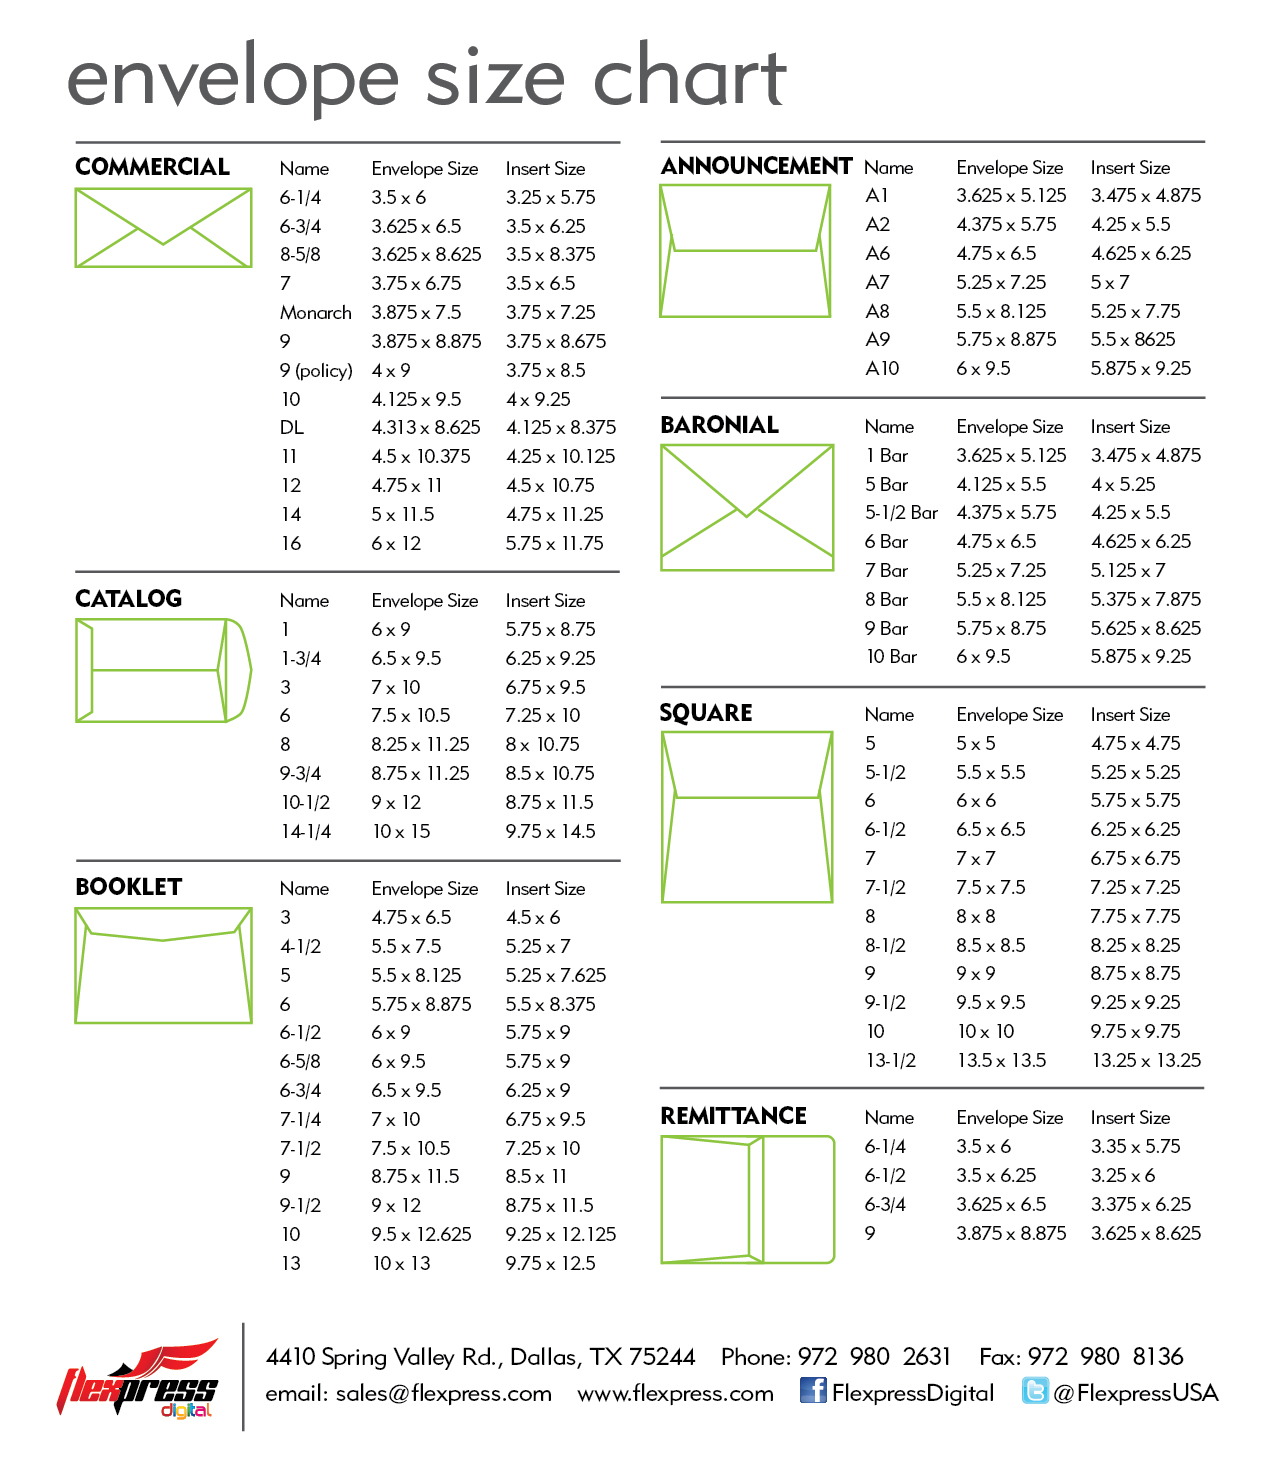 envelope size chart | flexpressdigital